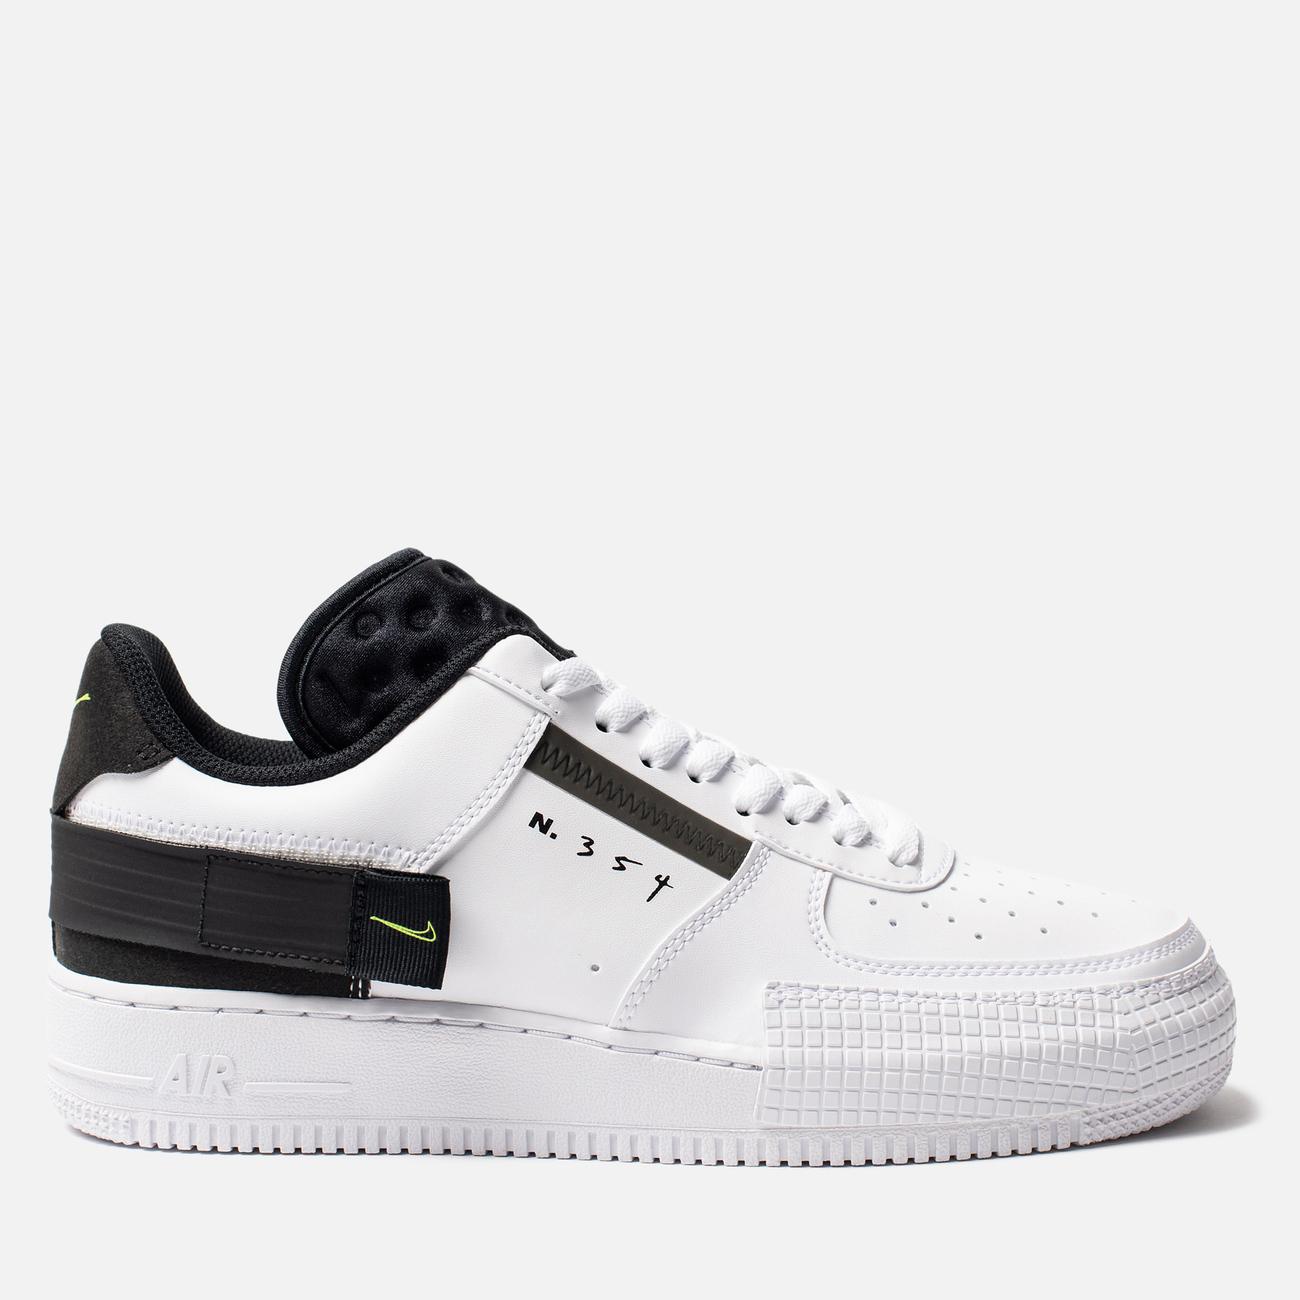 Кроссовки Nike Air Force 1 Type White/Volt/Black/White